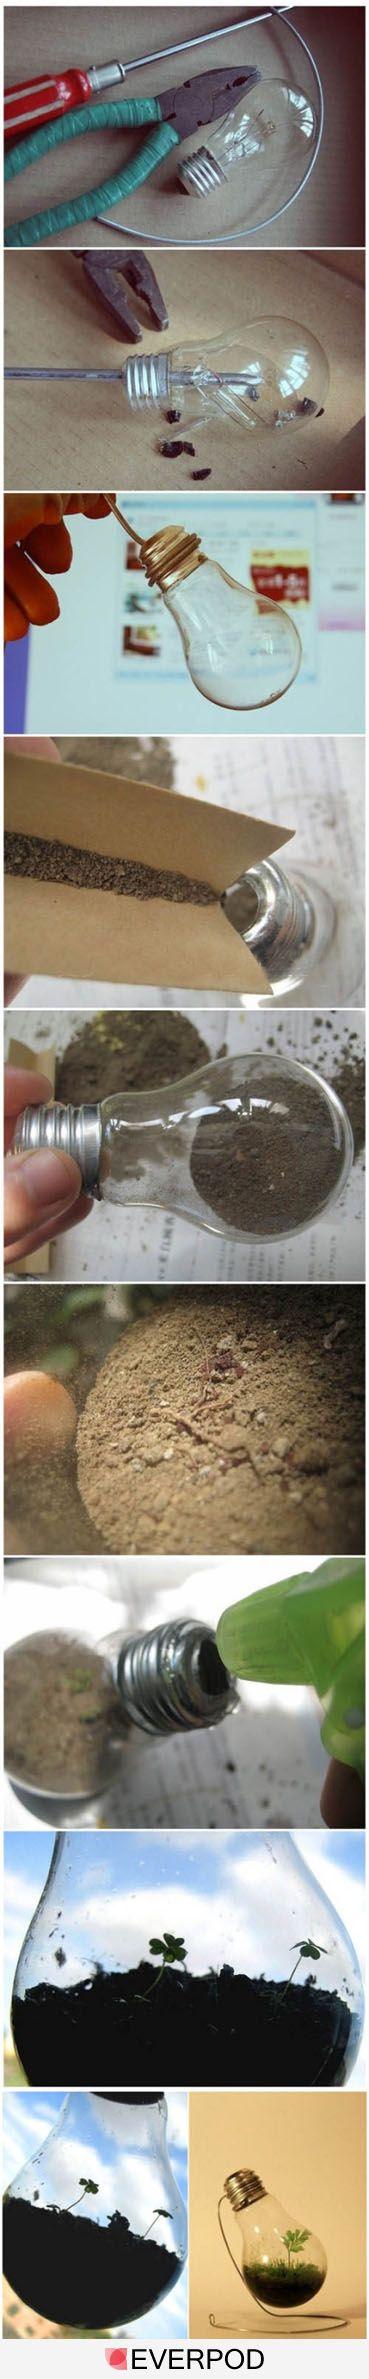 Mini Greenhouse in a lightbulb tutorial